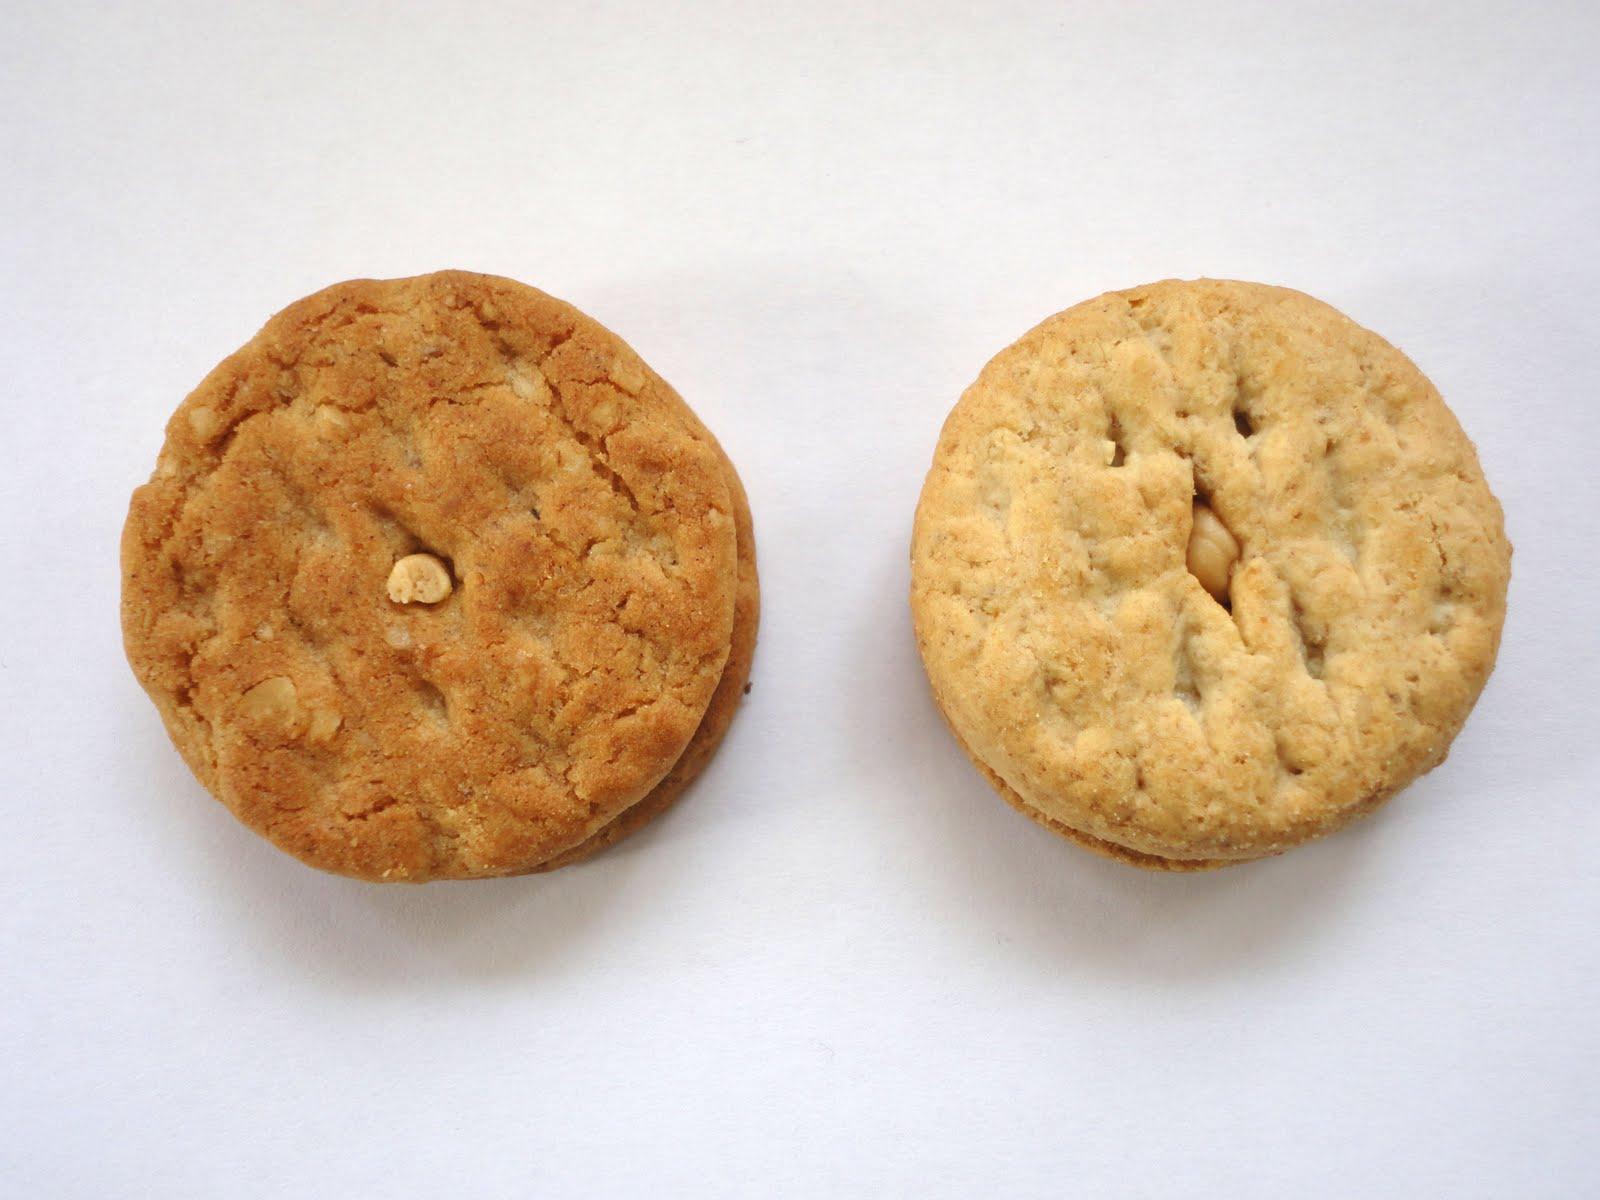 Busy Nothings: Girl Scout Cookie Taste Test